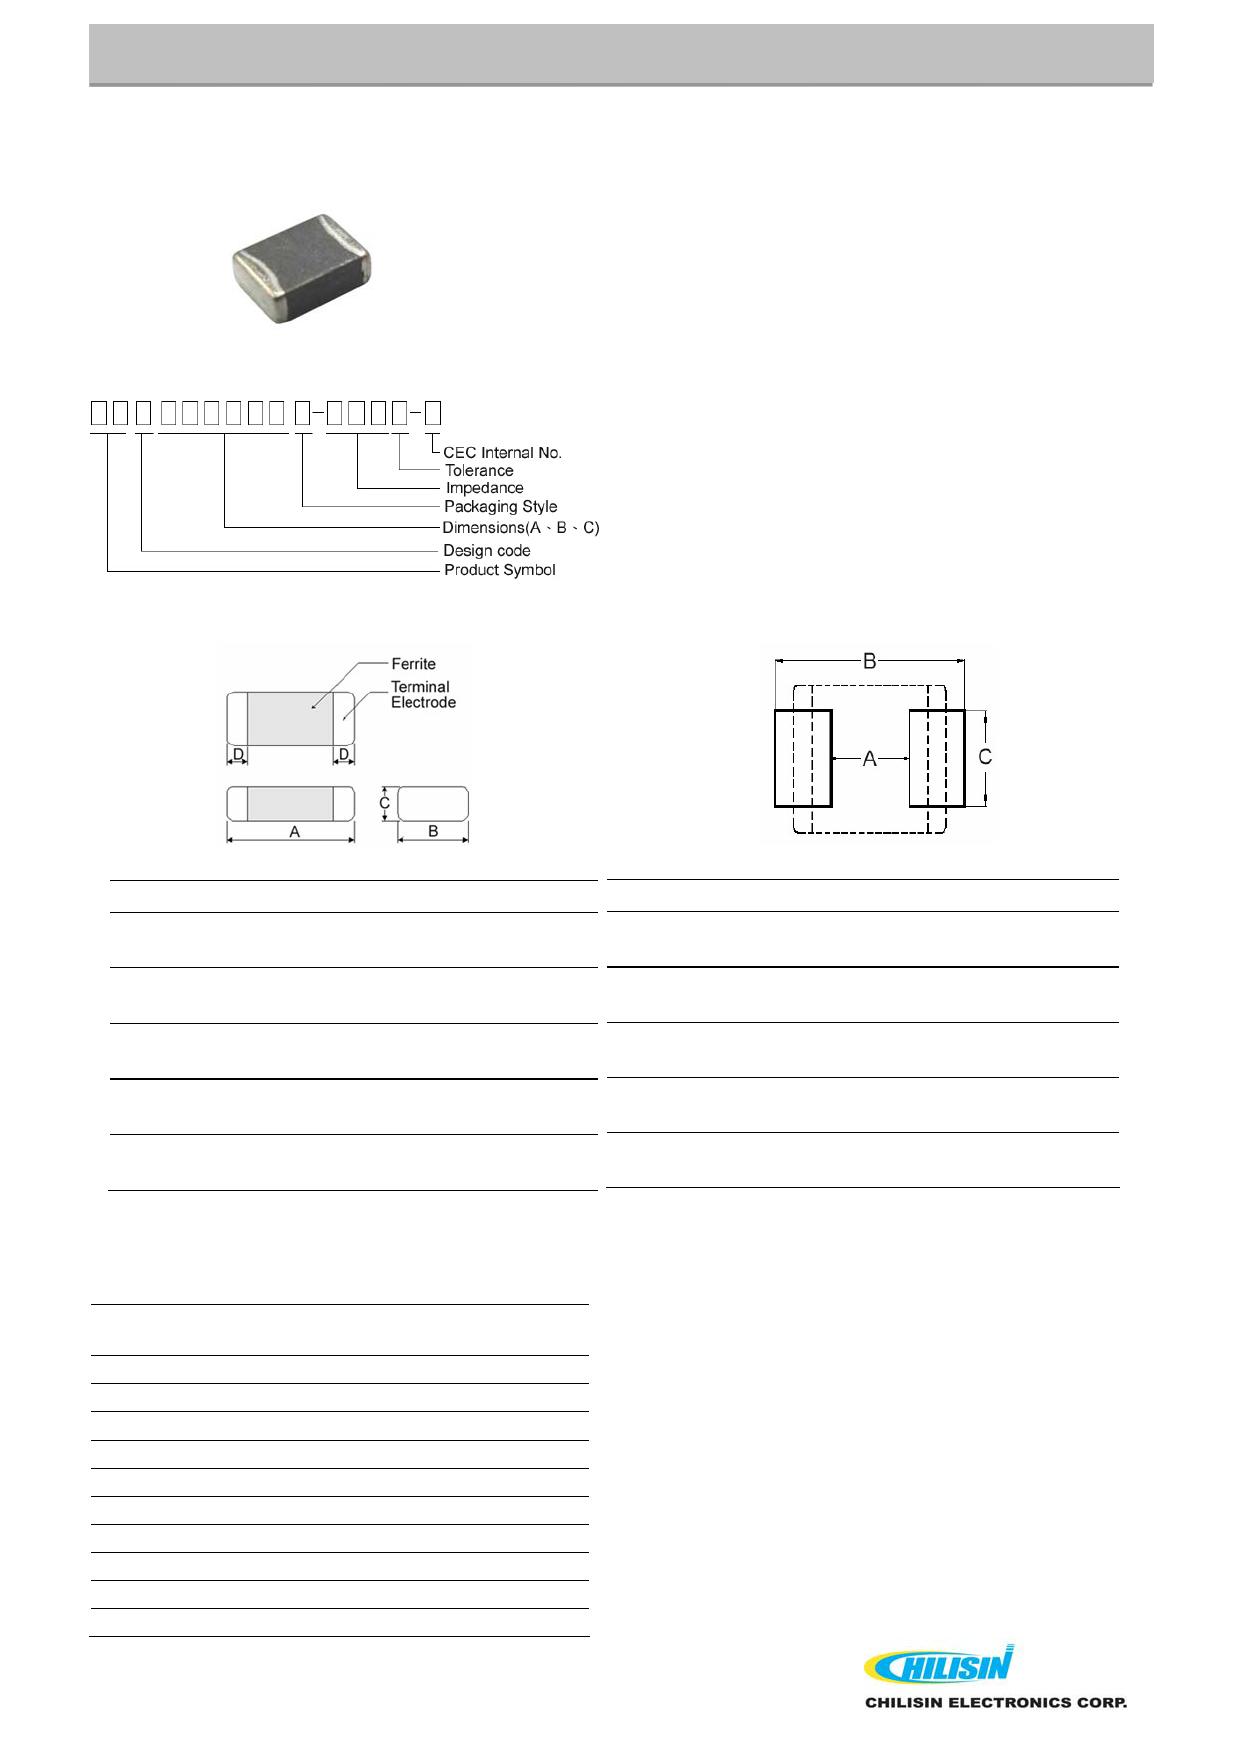 GBY201209T 데이터시트 및 GBY201209T PDF